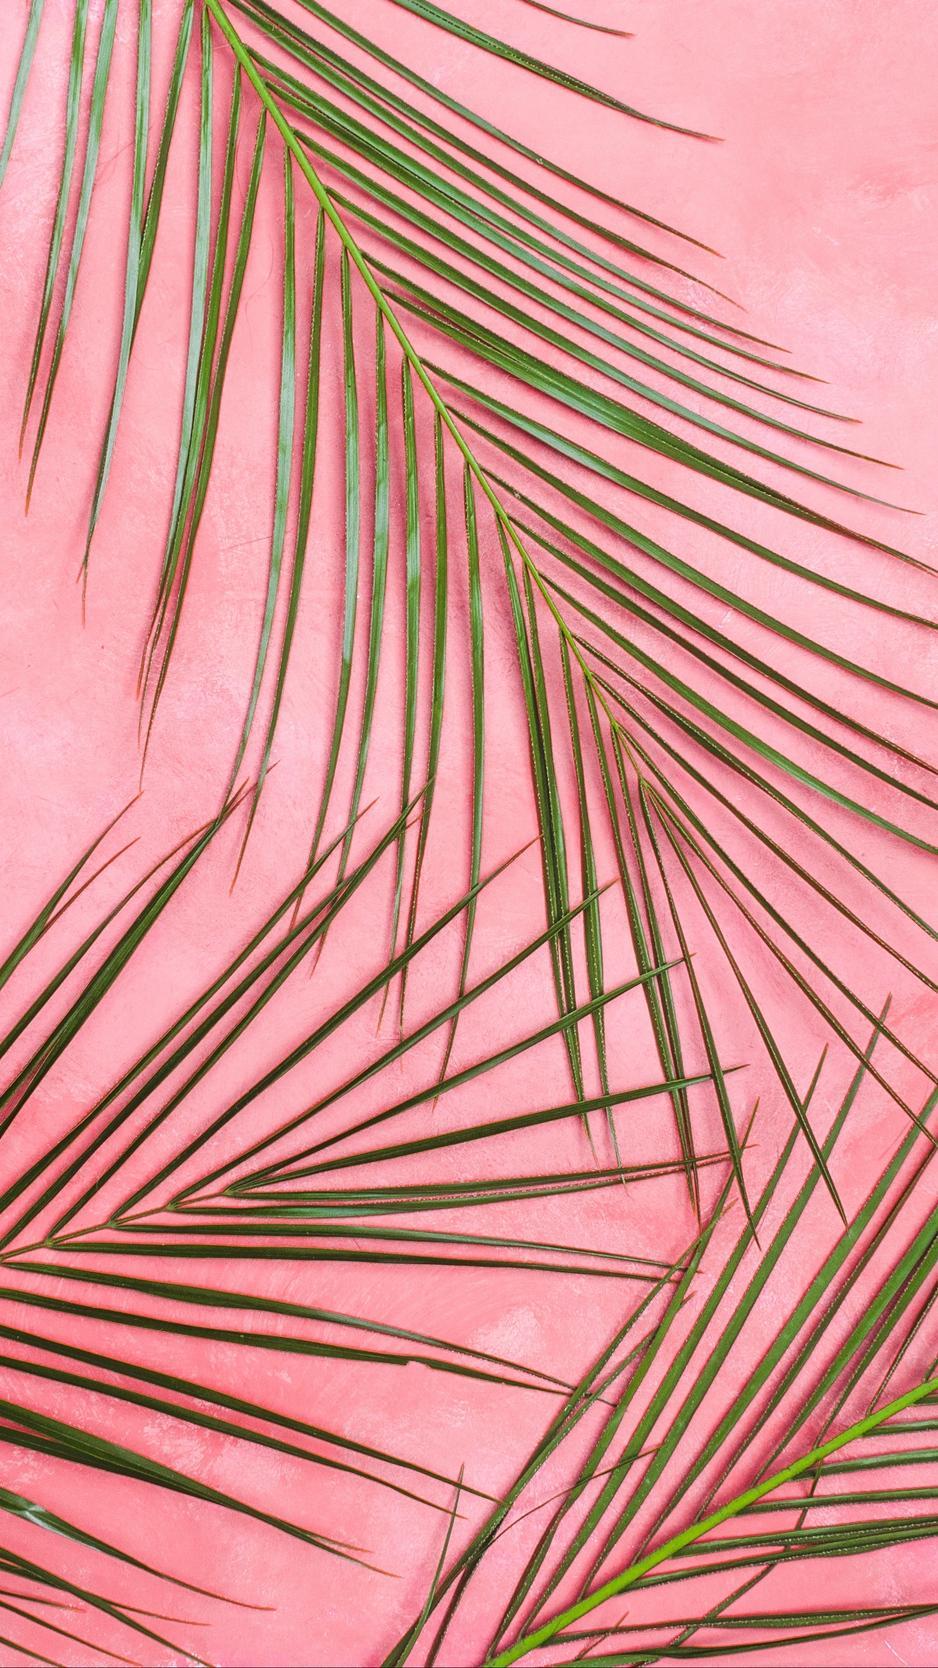 Aesthetic Pastel Minimalist Wallpapers - Wallpaper Cave